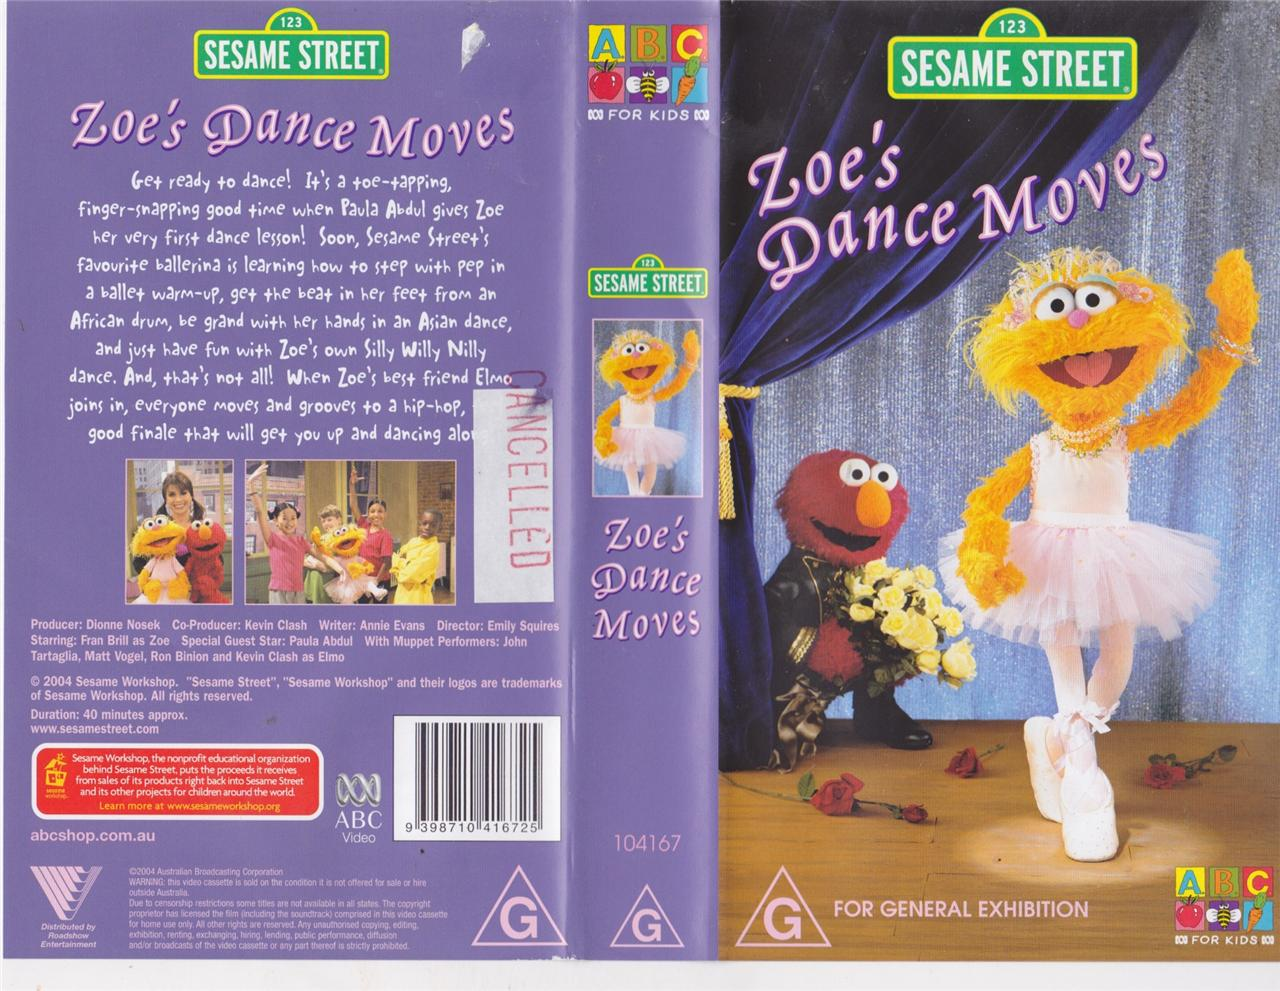 Sesame Street Vhs Deals On 1001 Blocks